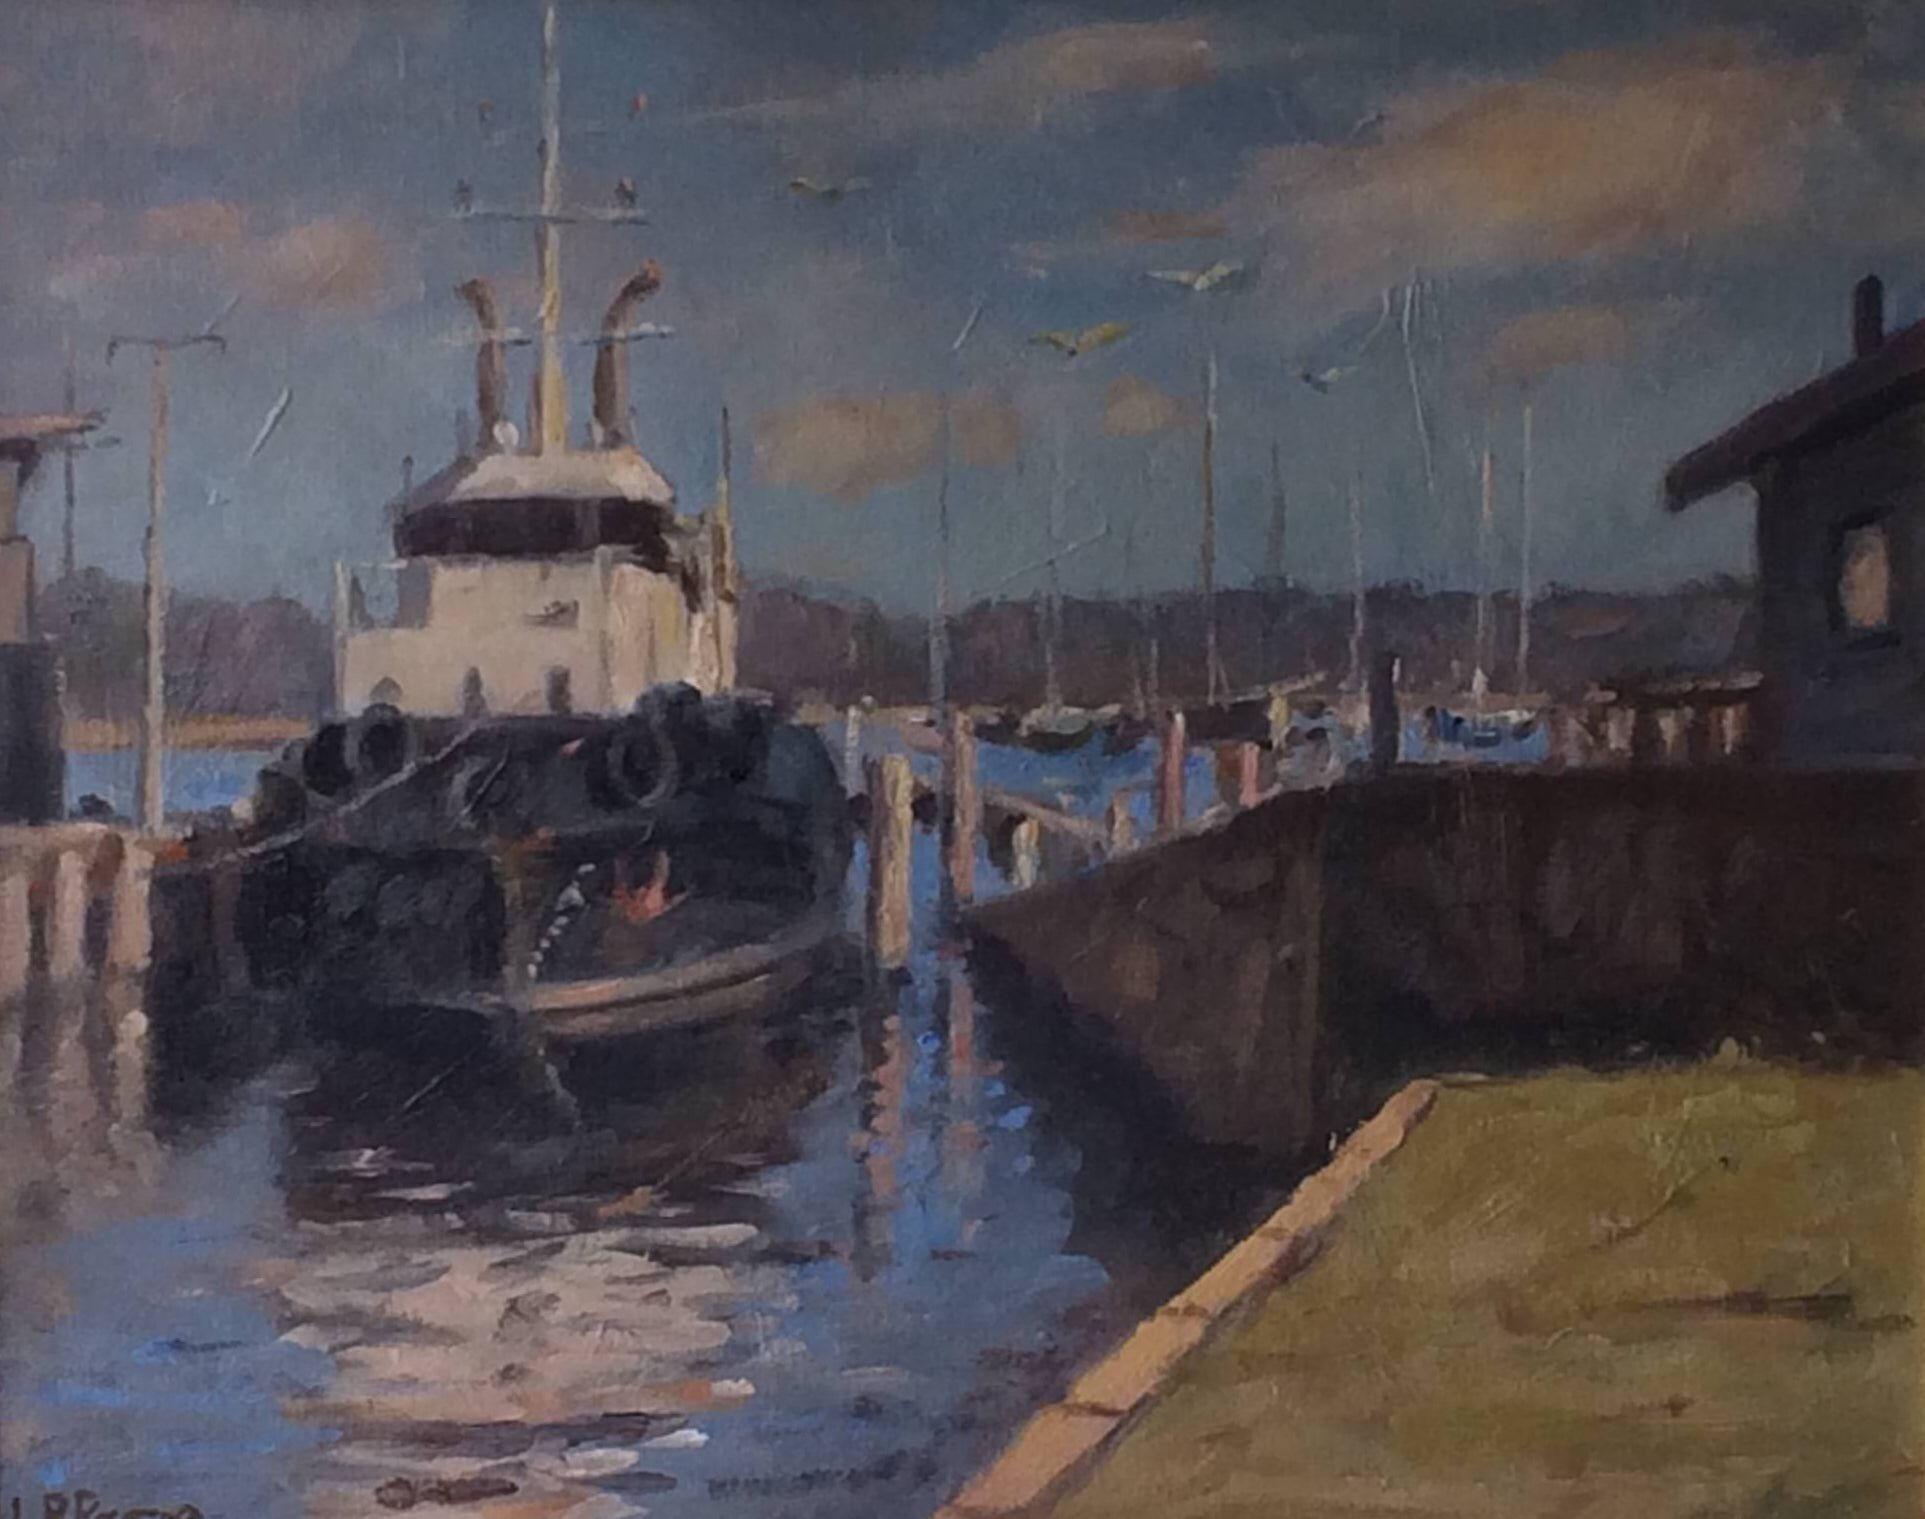 98 Tug boats